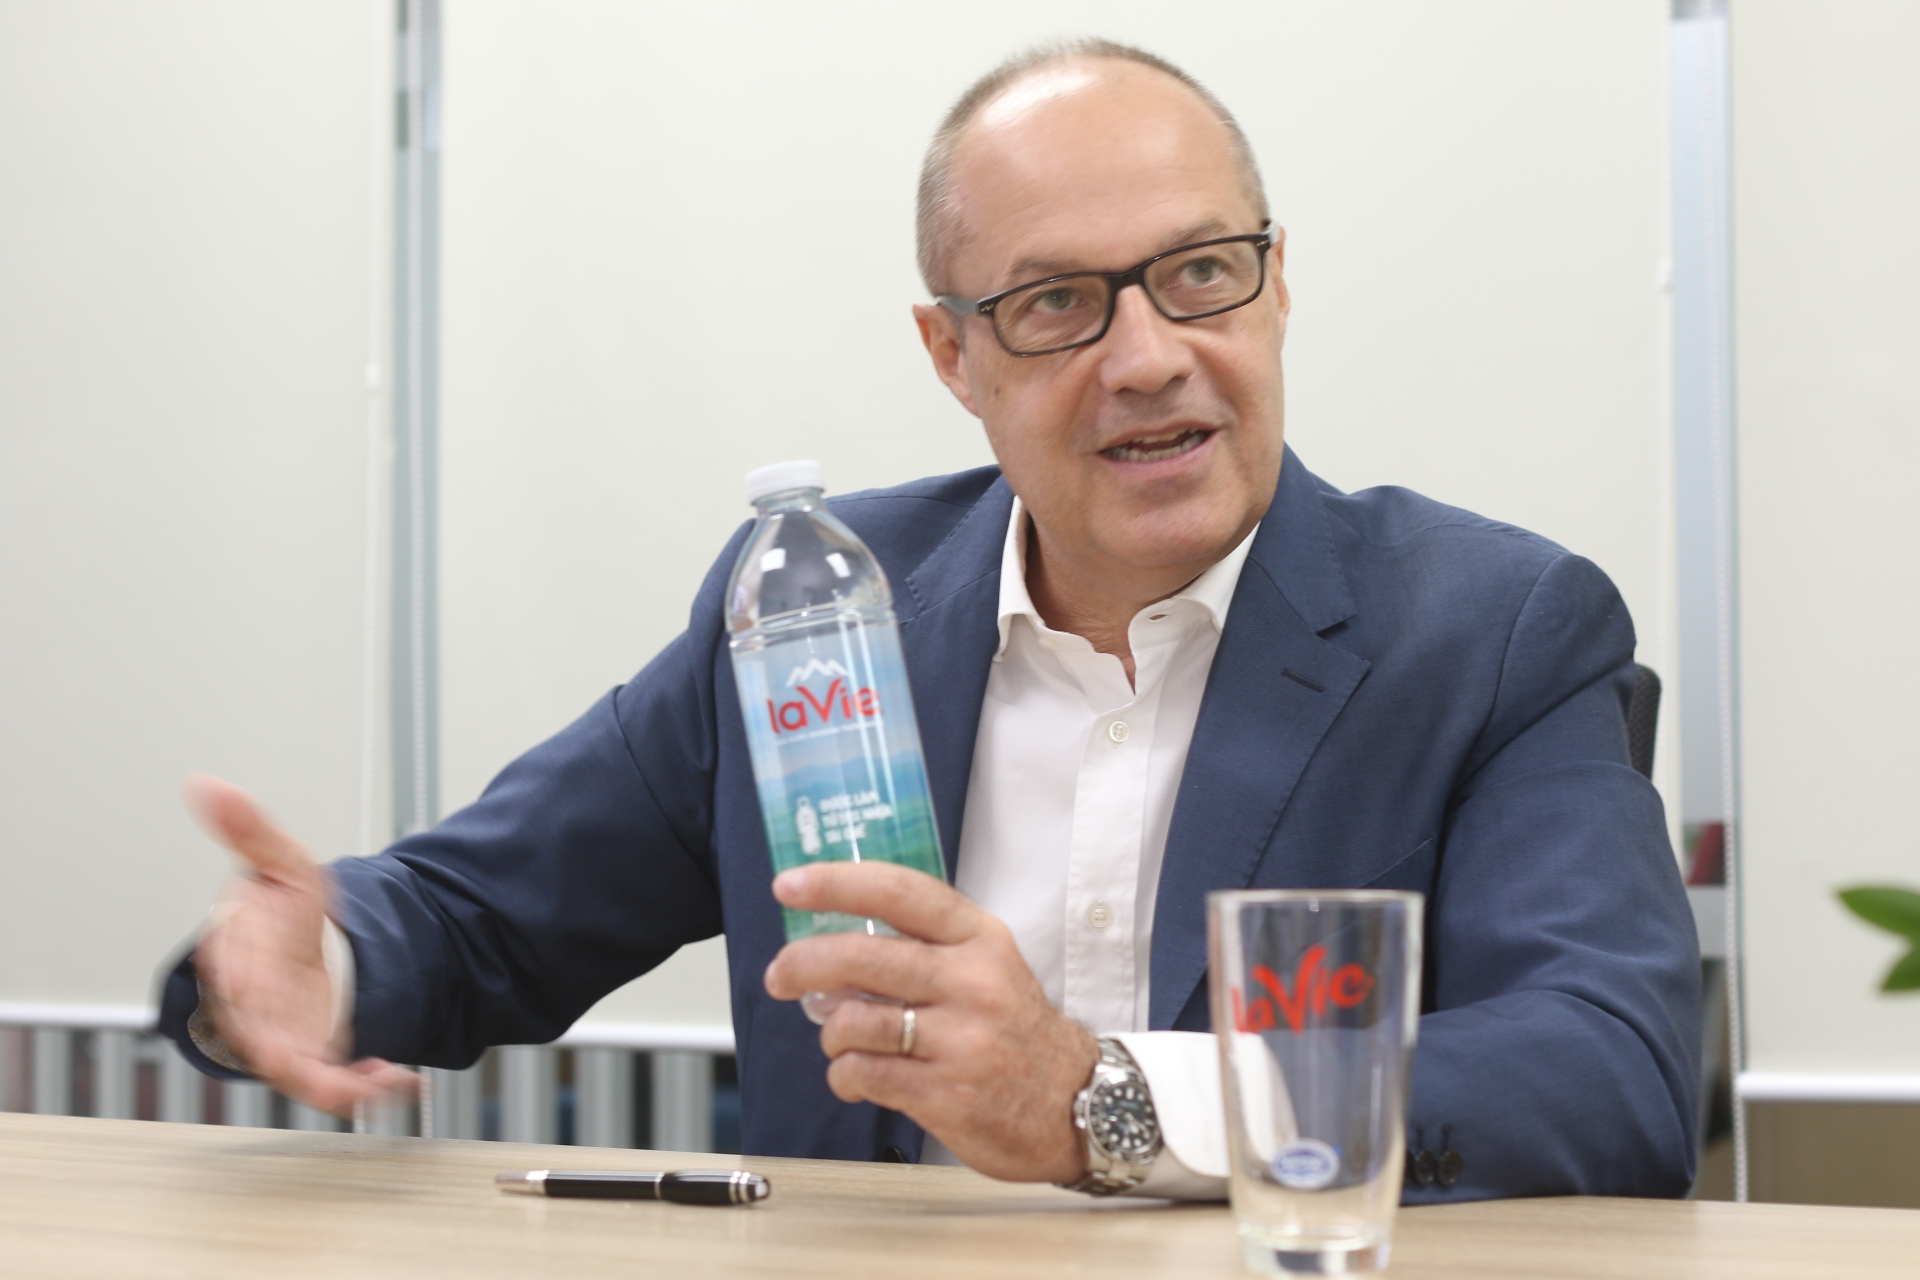 La Vie – flagship in accelerating circular economy